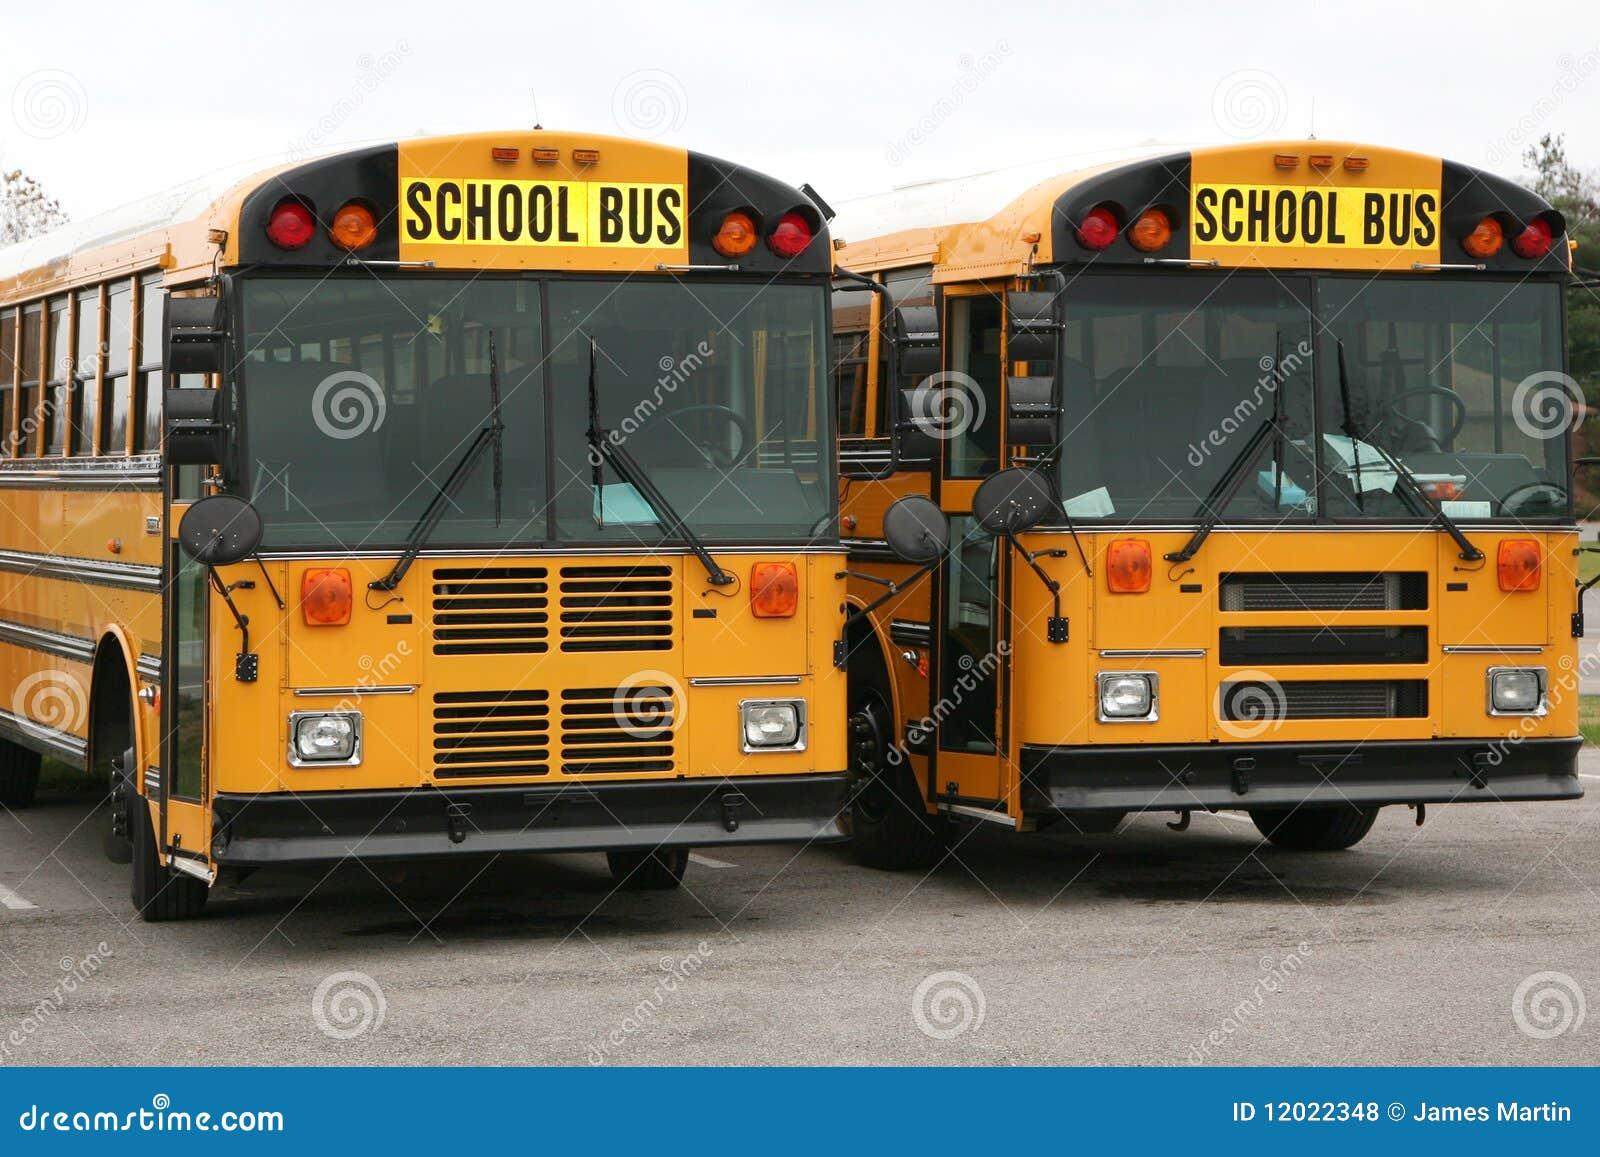 school bus royalty free stock photos image 12022348 Teacher Clip Art School Bus Teacher